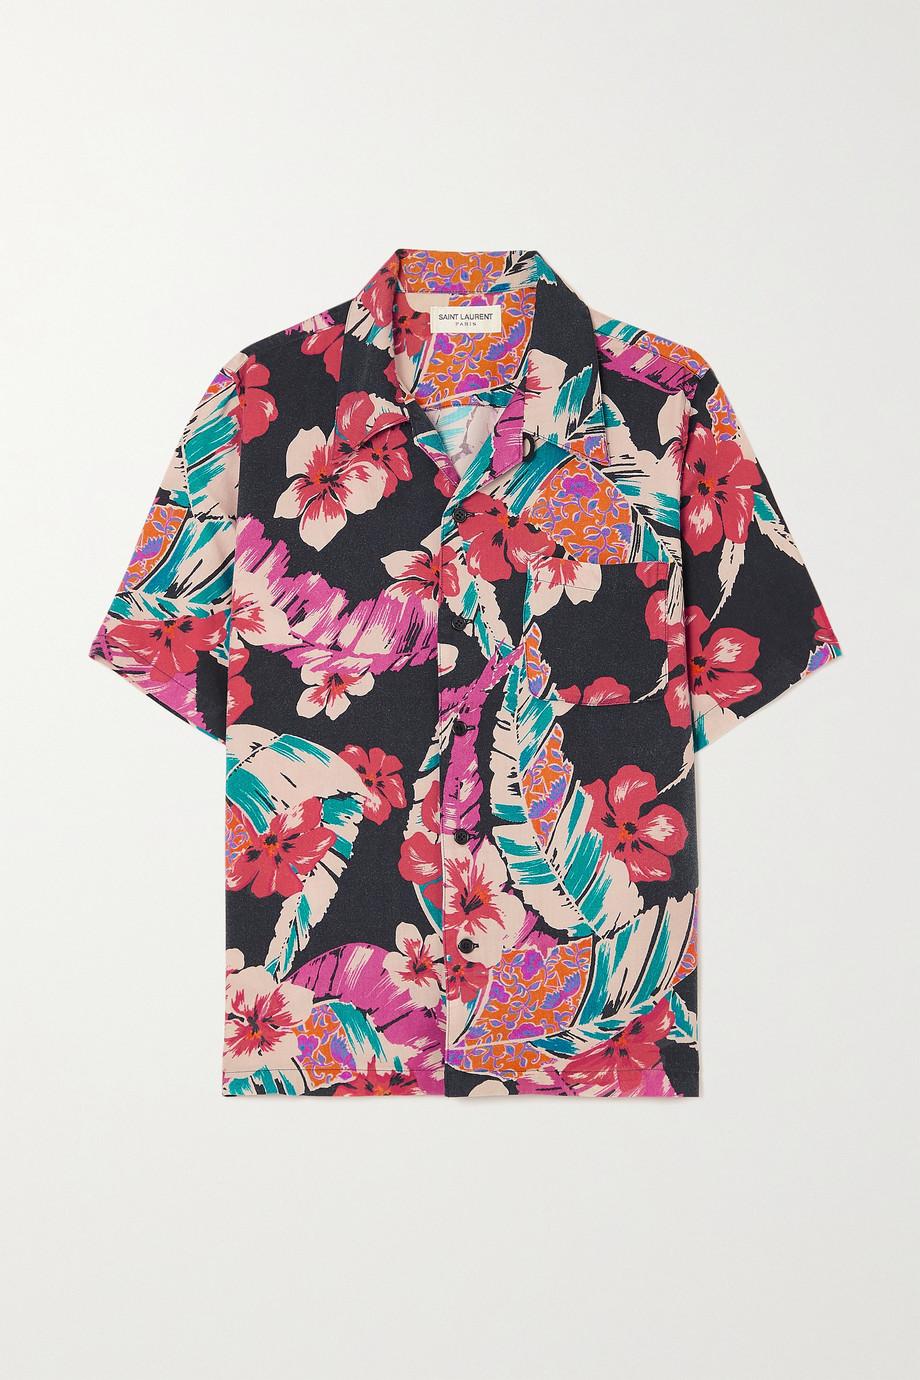 SAINT LAURENT Floral-print twill shirt